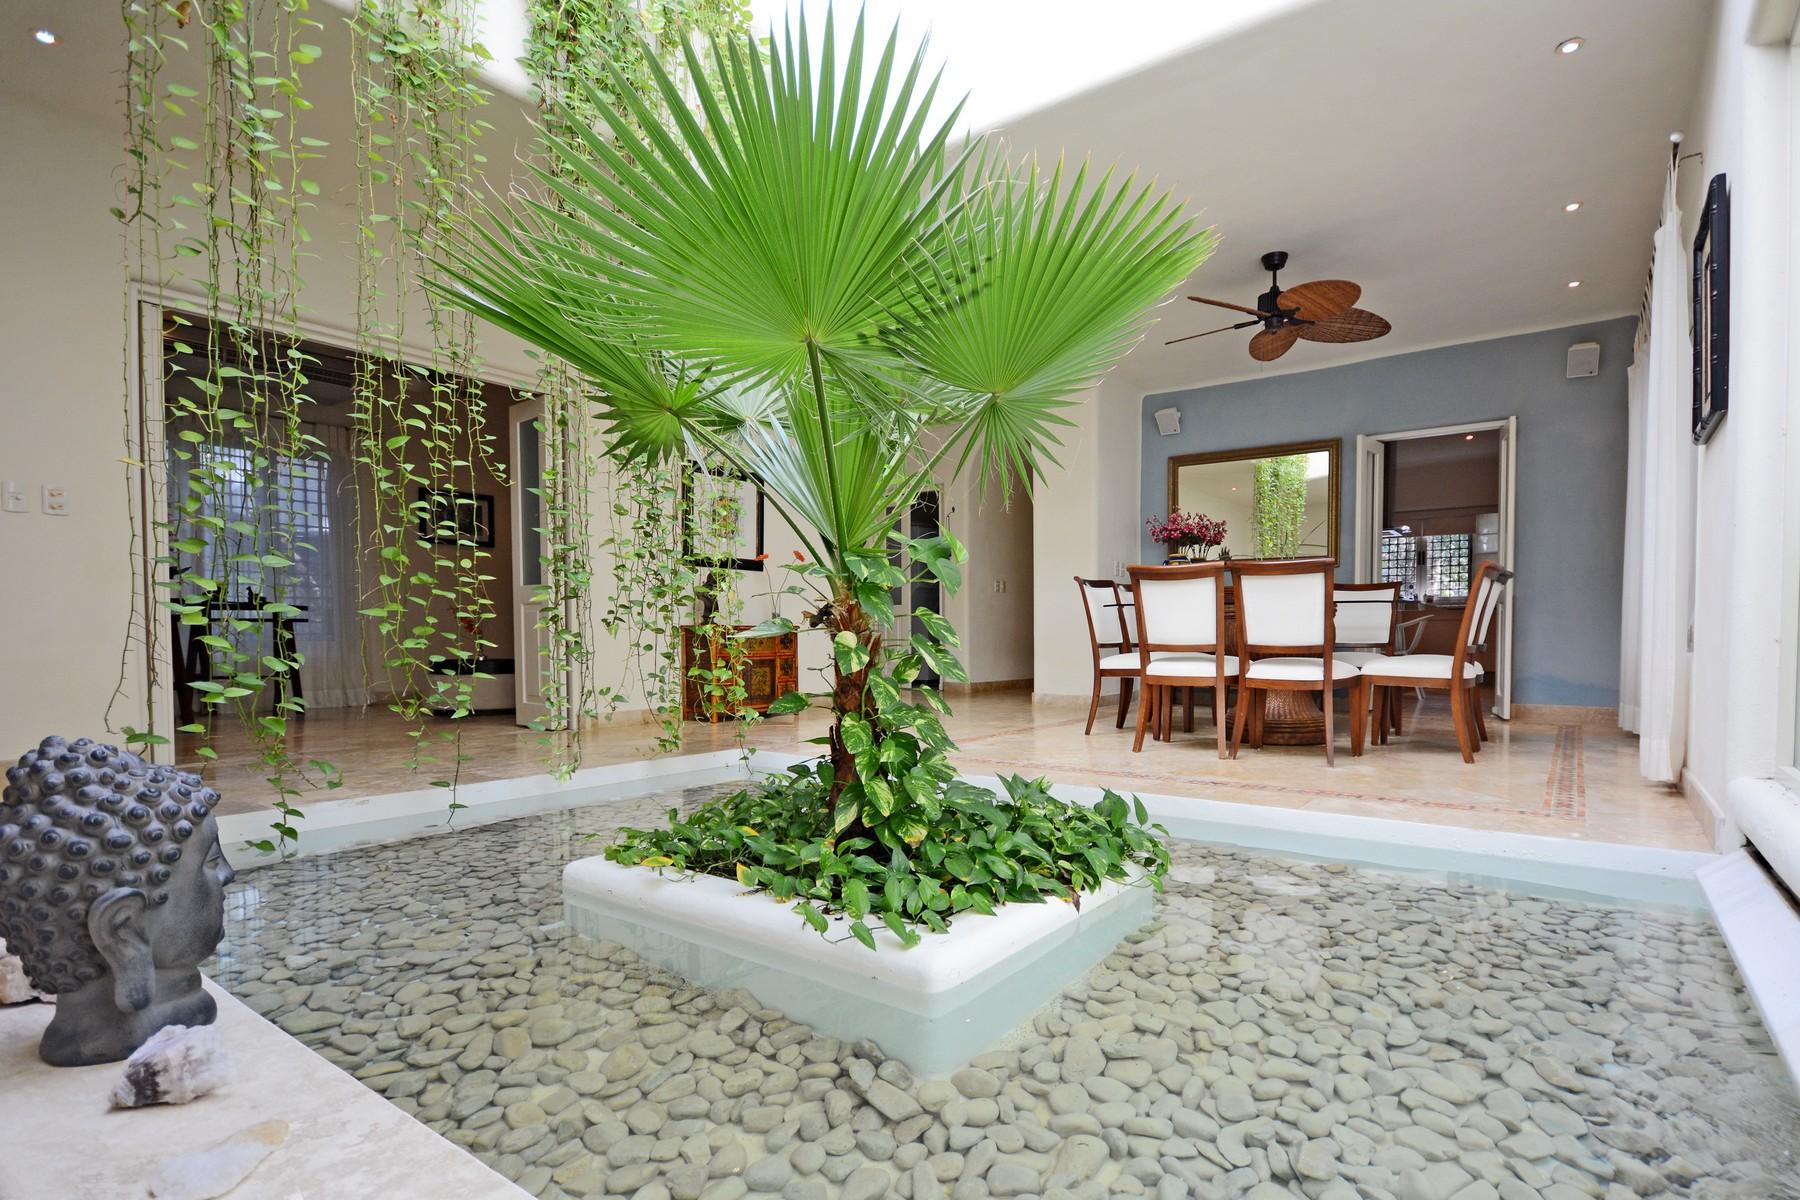 Additional photo for property listing at SERENITY HOME Retorno Copán Condominio Club Real Mza 22, C 73 Playa Del Carmen, Quintana Roo 777 Mexico